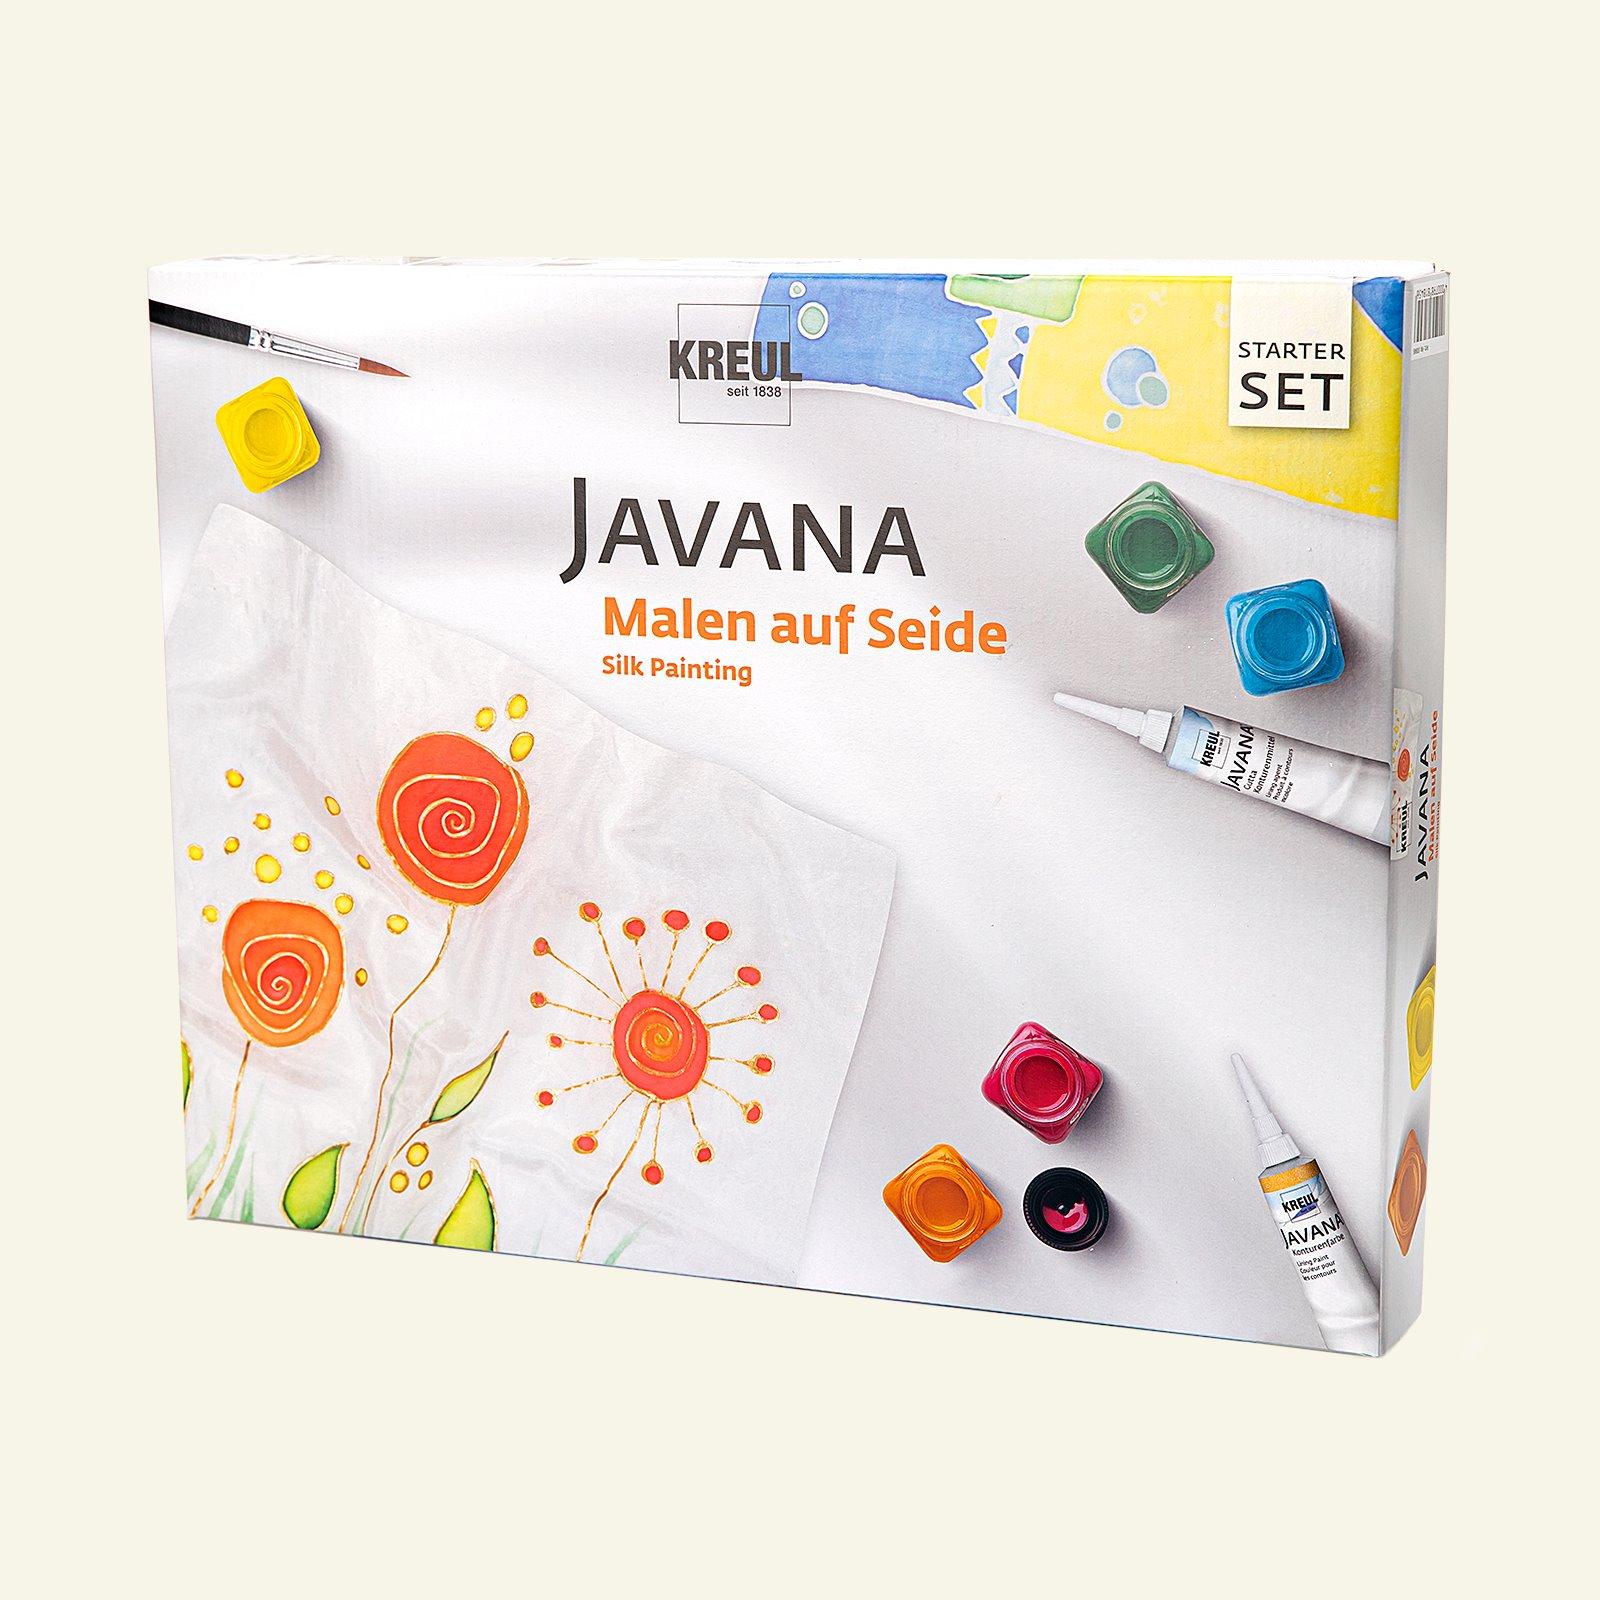 Javana Seidenfarbe, Starterset 29630_pack_d